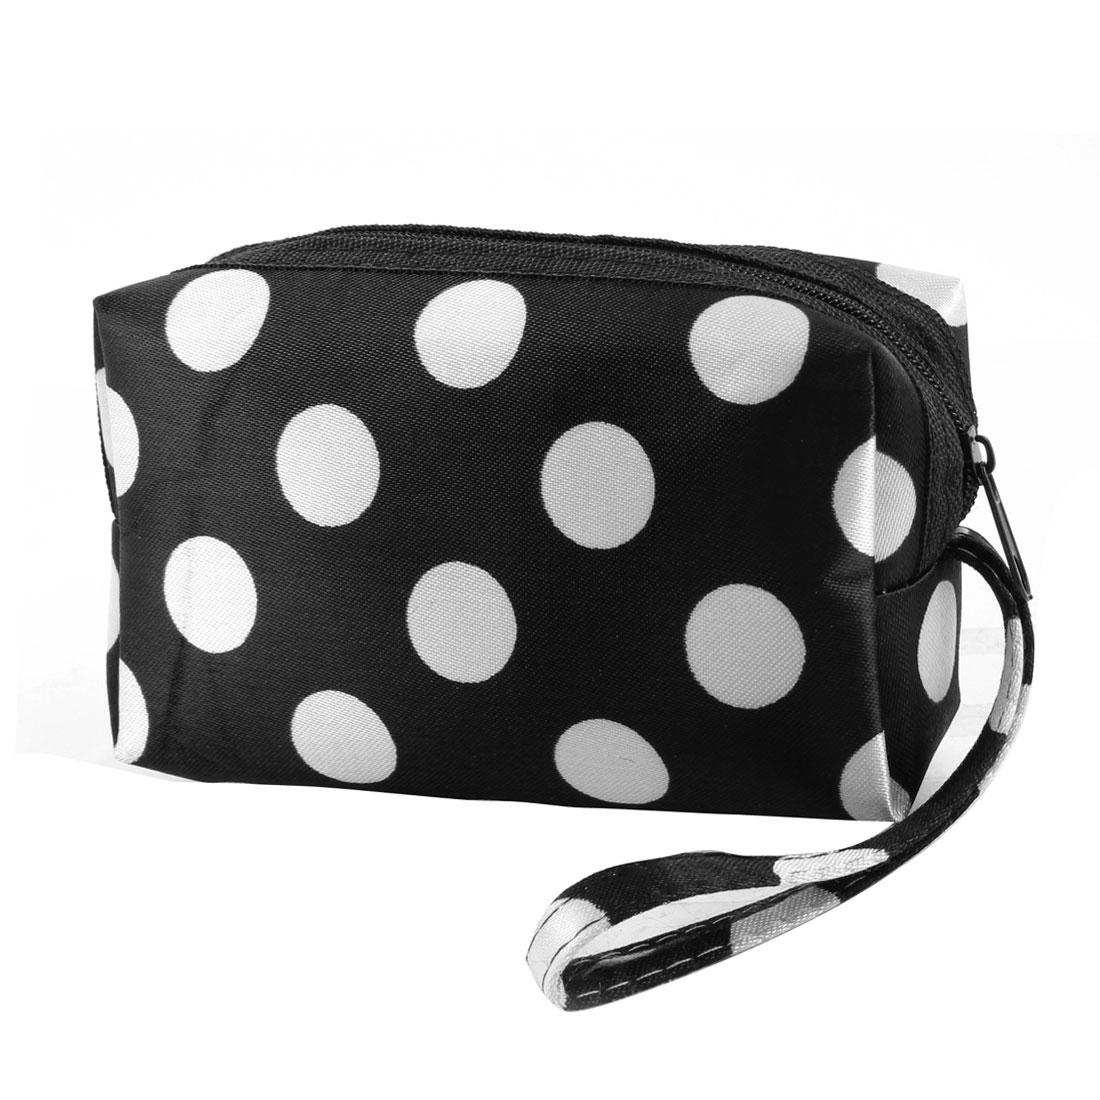 Lady Zip Up White Dots Detail Black Wallet Purse Bag w Handstrap